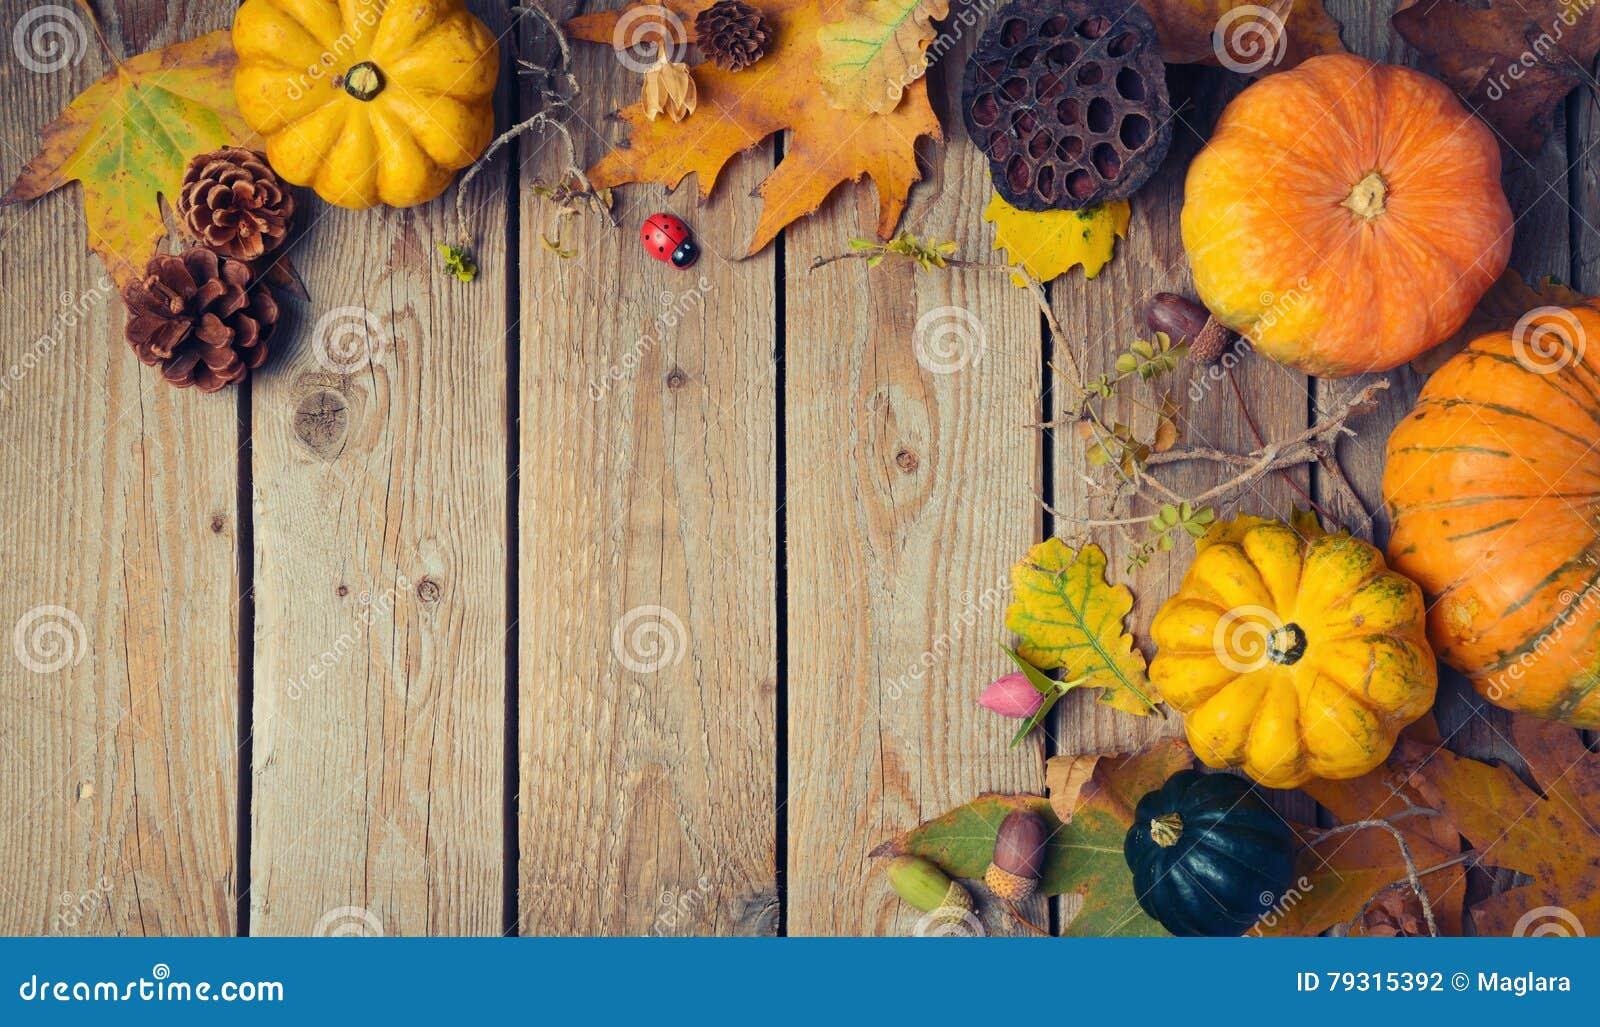 thanksgiving dinner background  autumn pumpkin and fall